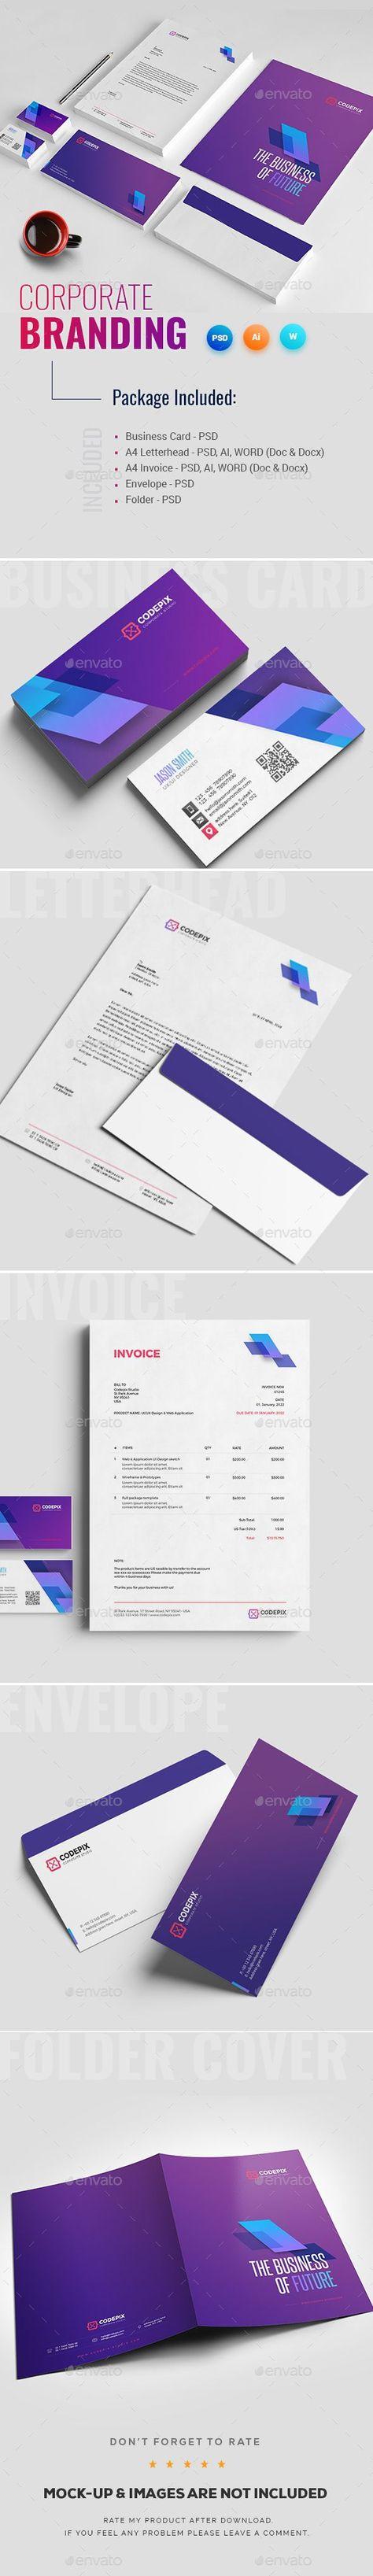 Corporate Identity Design Template PSD, AI Illustrator. Download - High resoluti... ,  #Corporate #corporateidentitywhite #design #Download #High #Identity #Illustrator #PSD #resoluti #Template